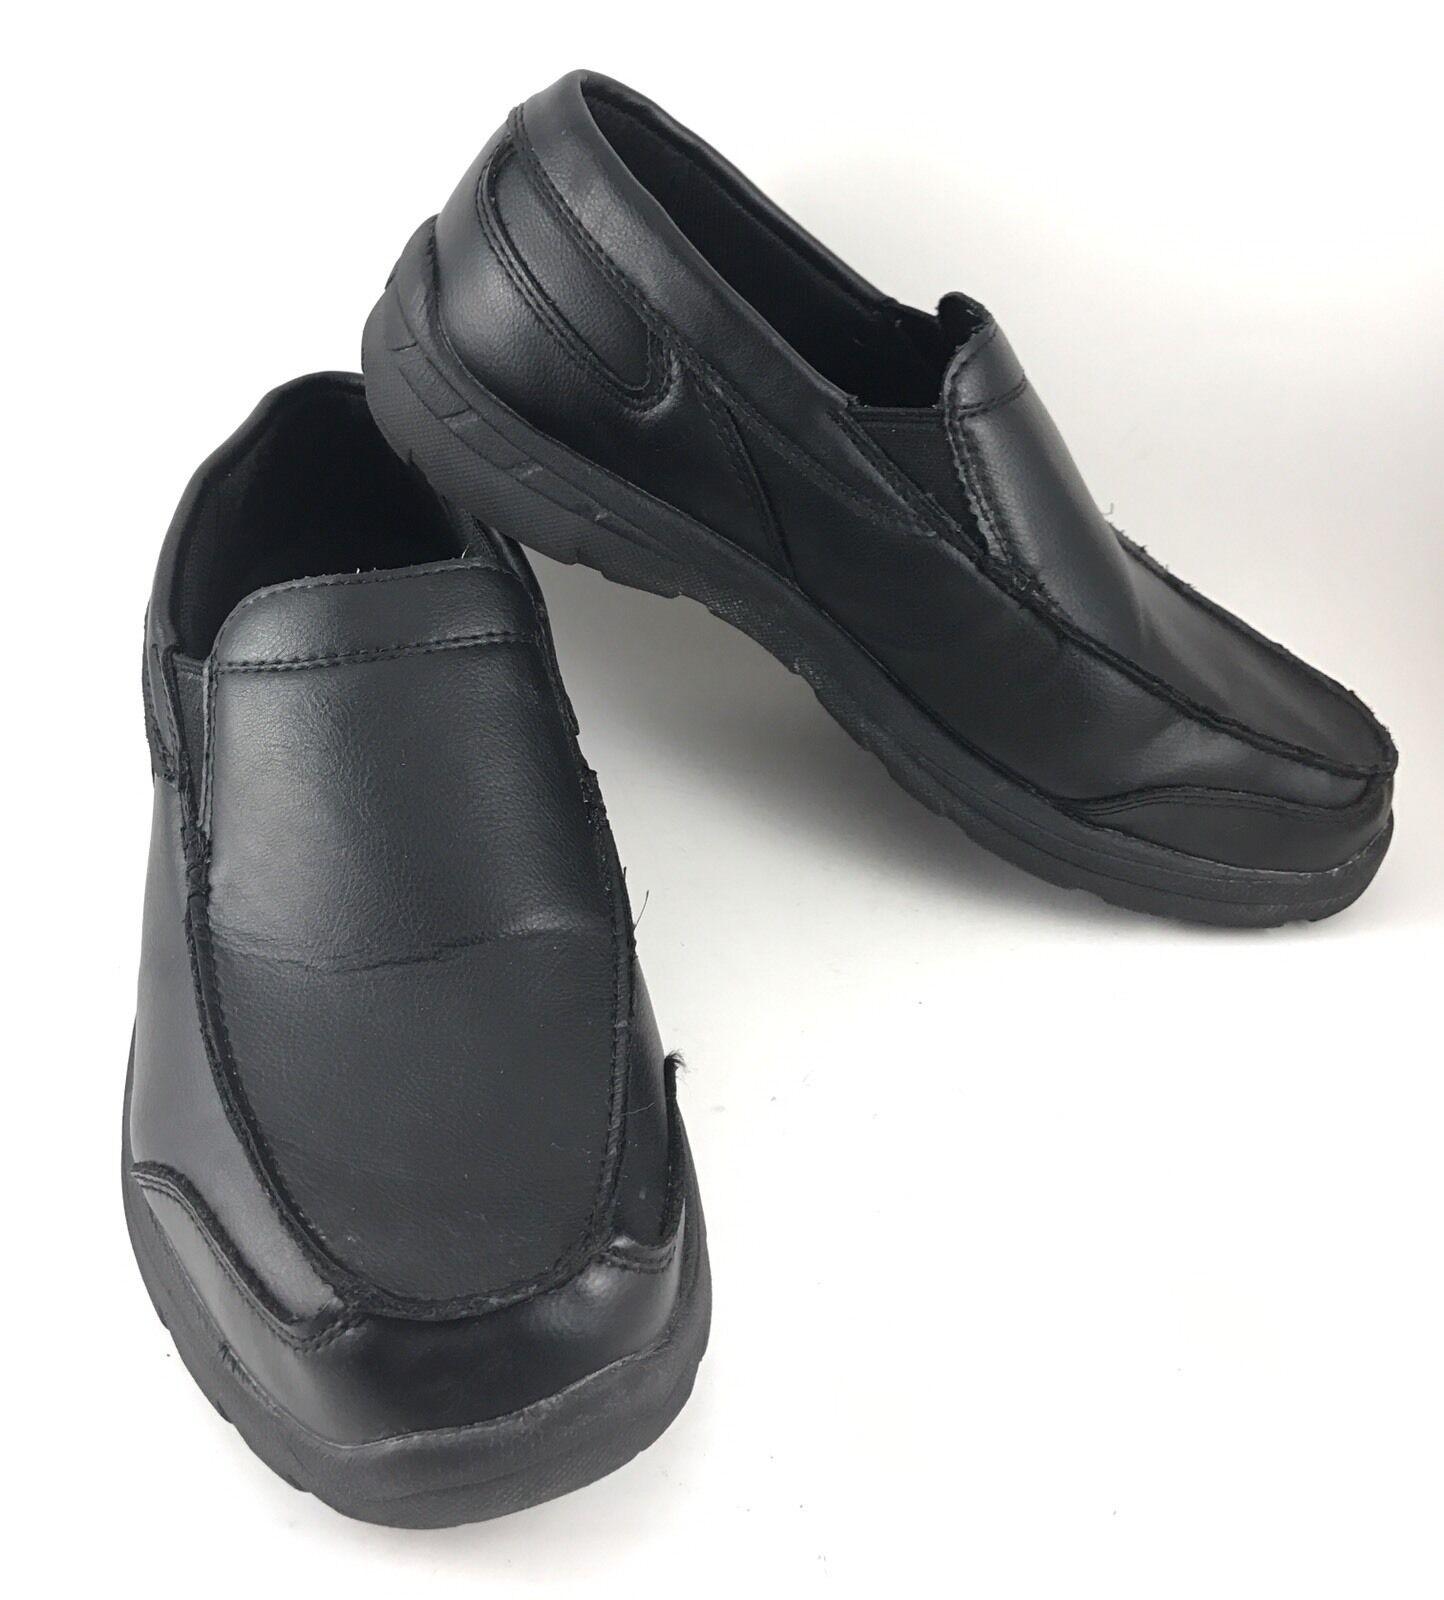 Mens TredSafe Slip Casual Resistant Size 9 Black Leather Dress Casual Slip SlipOn Loafers-78 e17db3